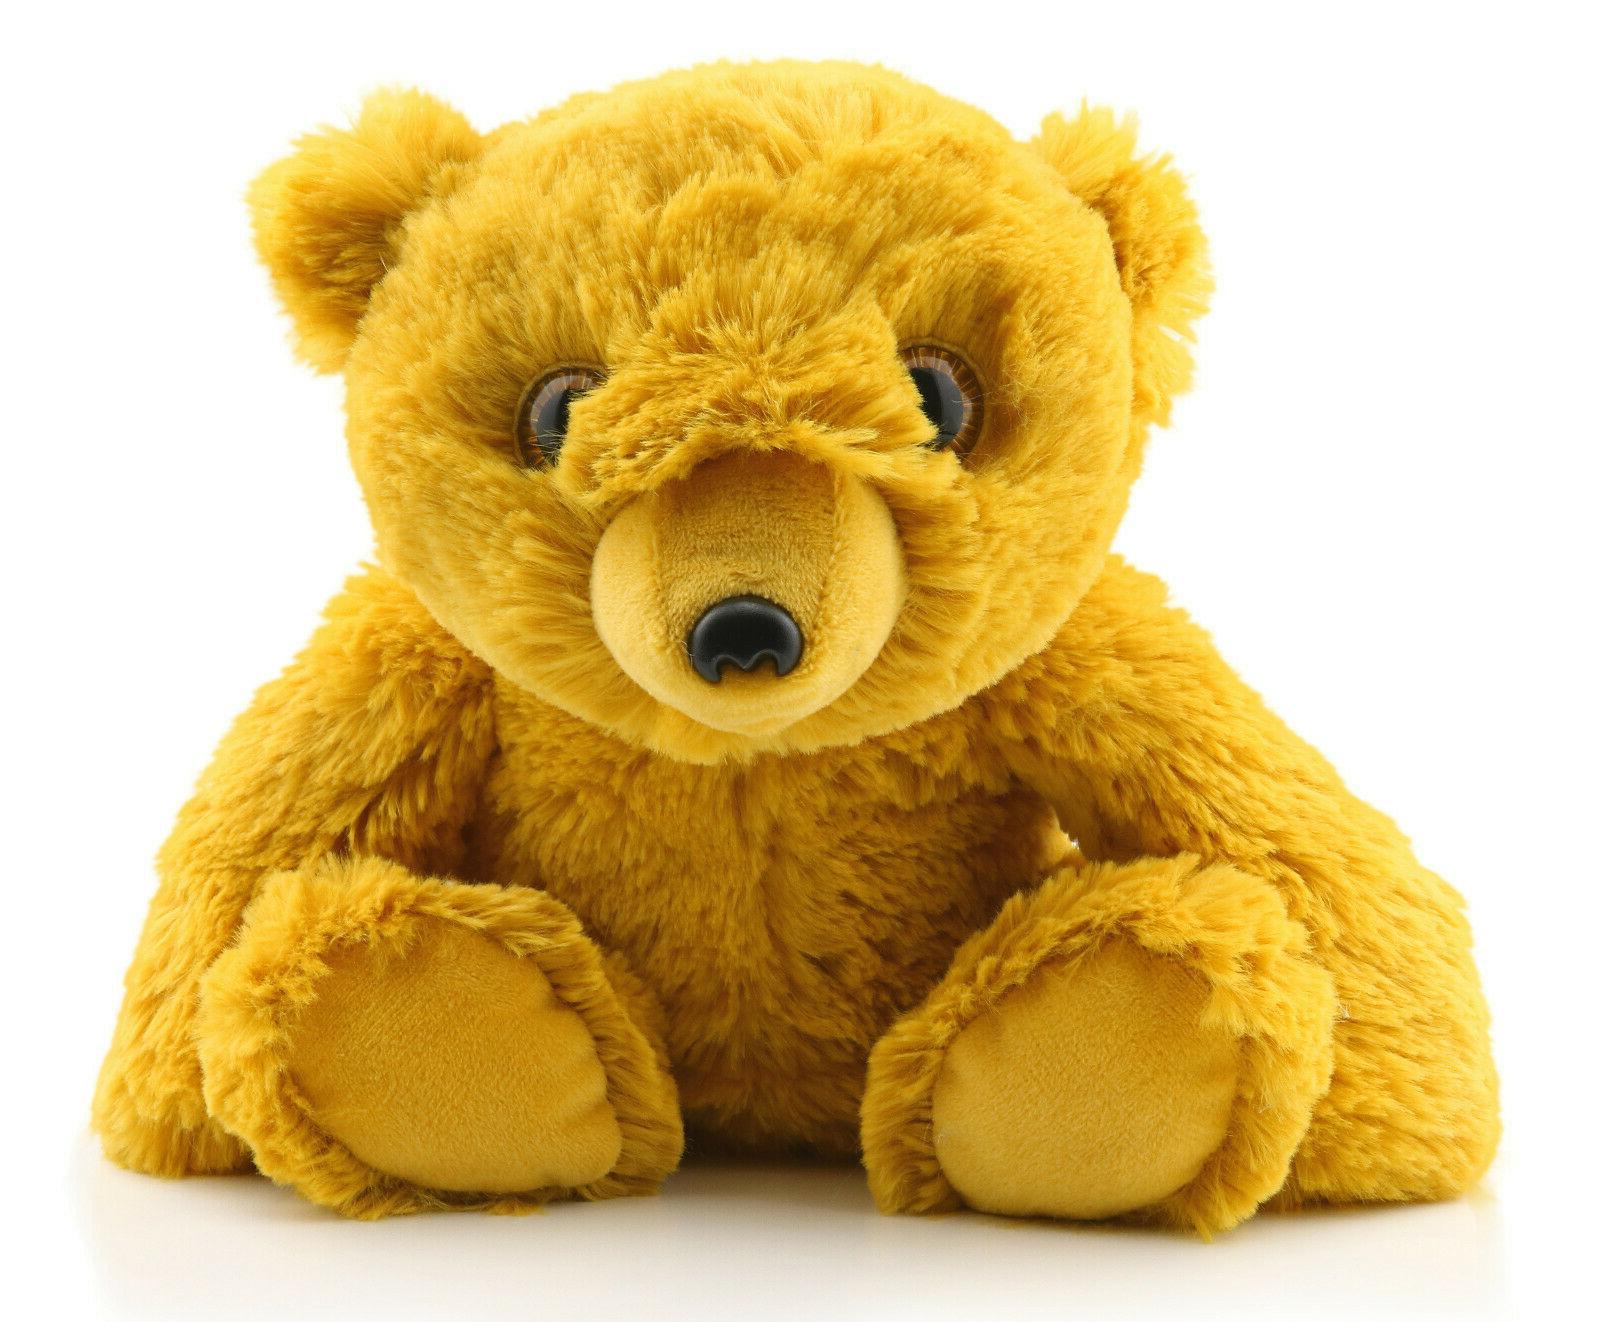 Toy - ICE BEAR